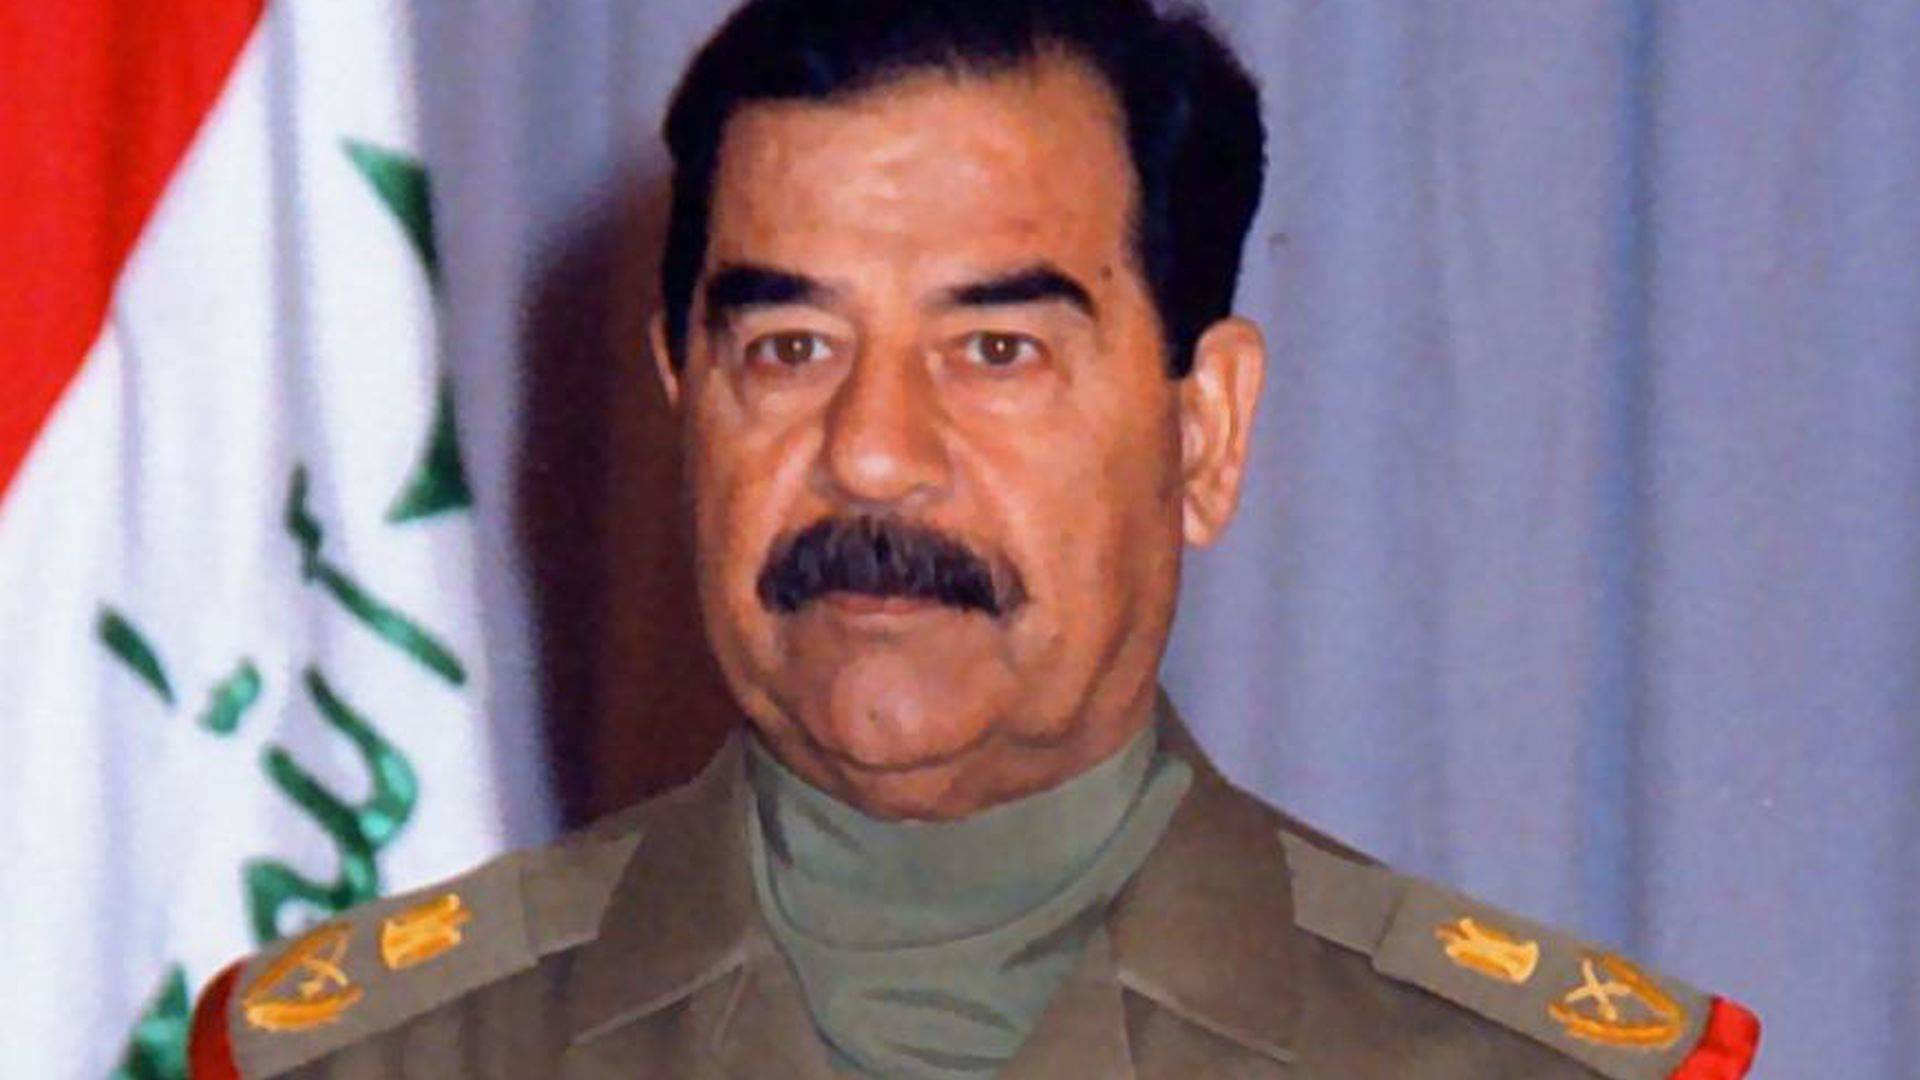 CIA - Saddam Husseins